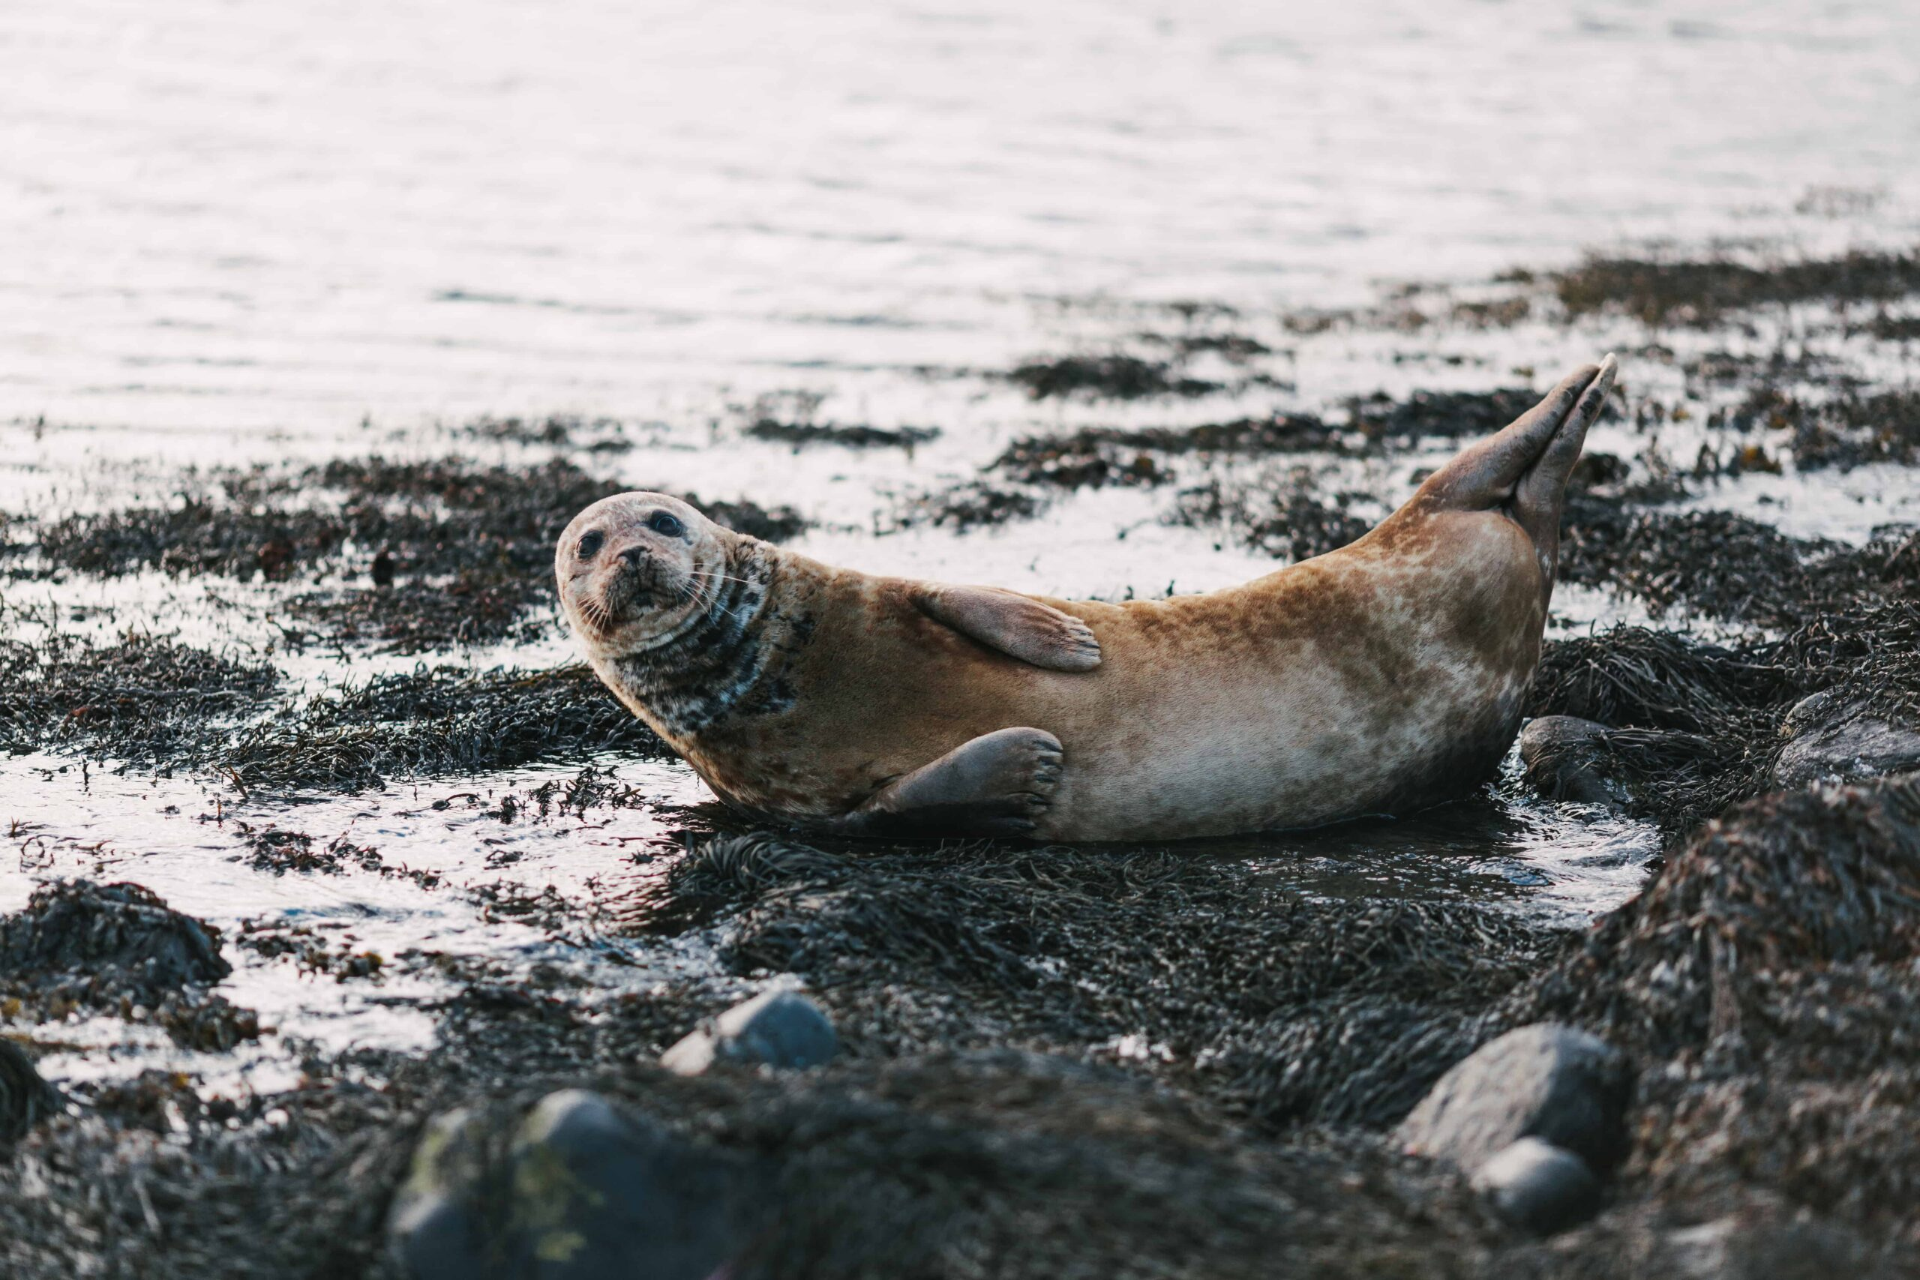 Ytri Tunga seal colony - Snæfellsnes Peninsula, seal watching in Iceland